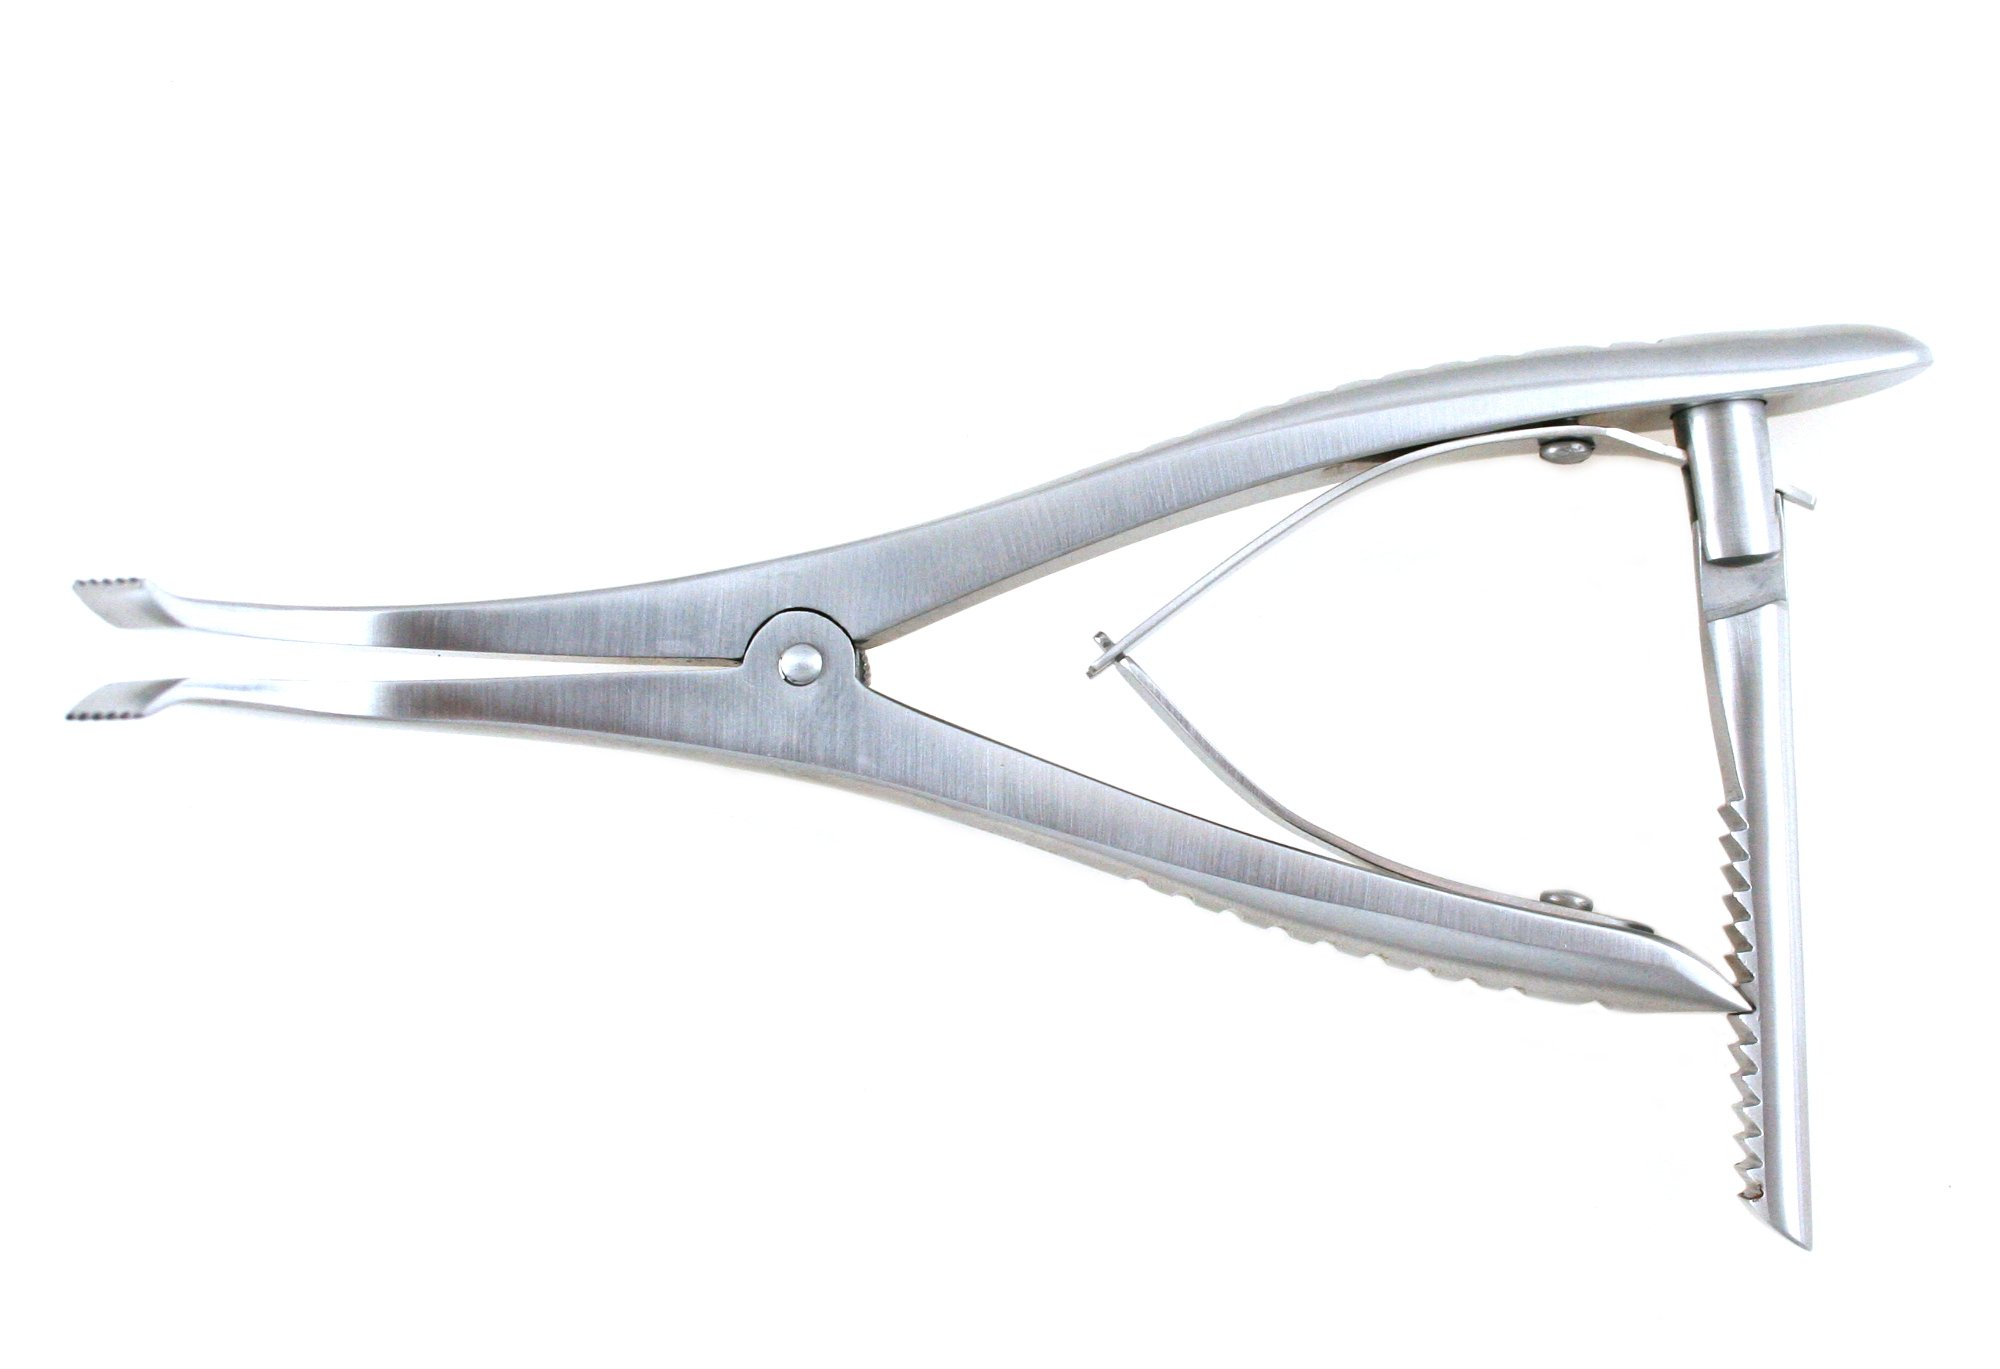 Inge Lamina Spreader 9.5'' Jaws Open to 44mm | Medixplus